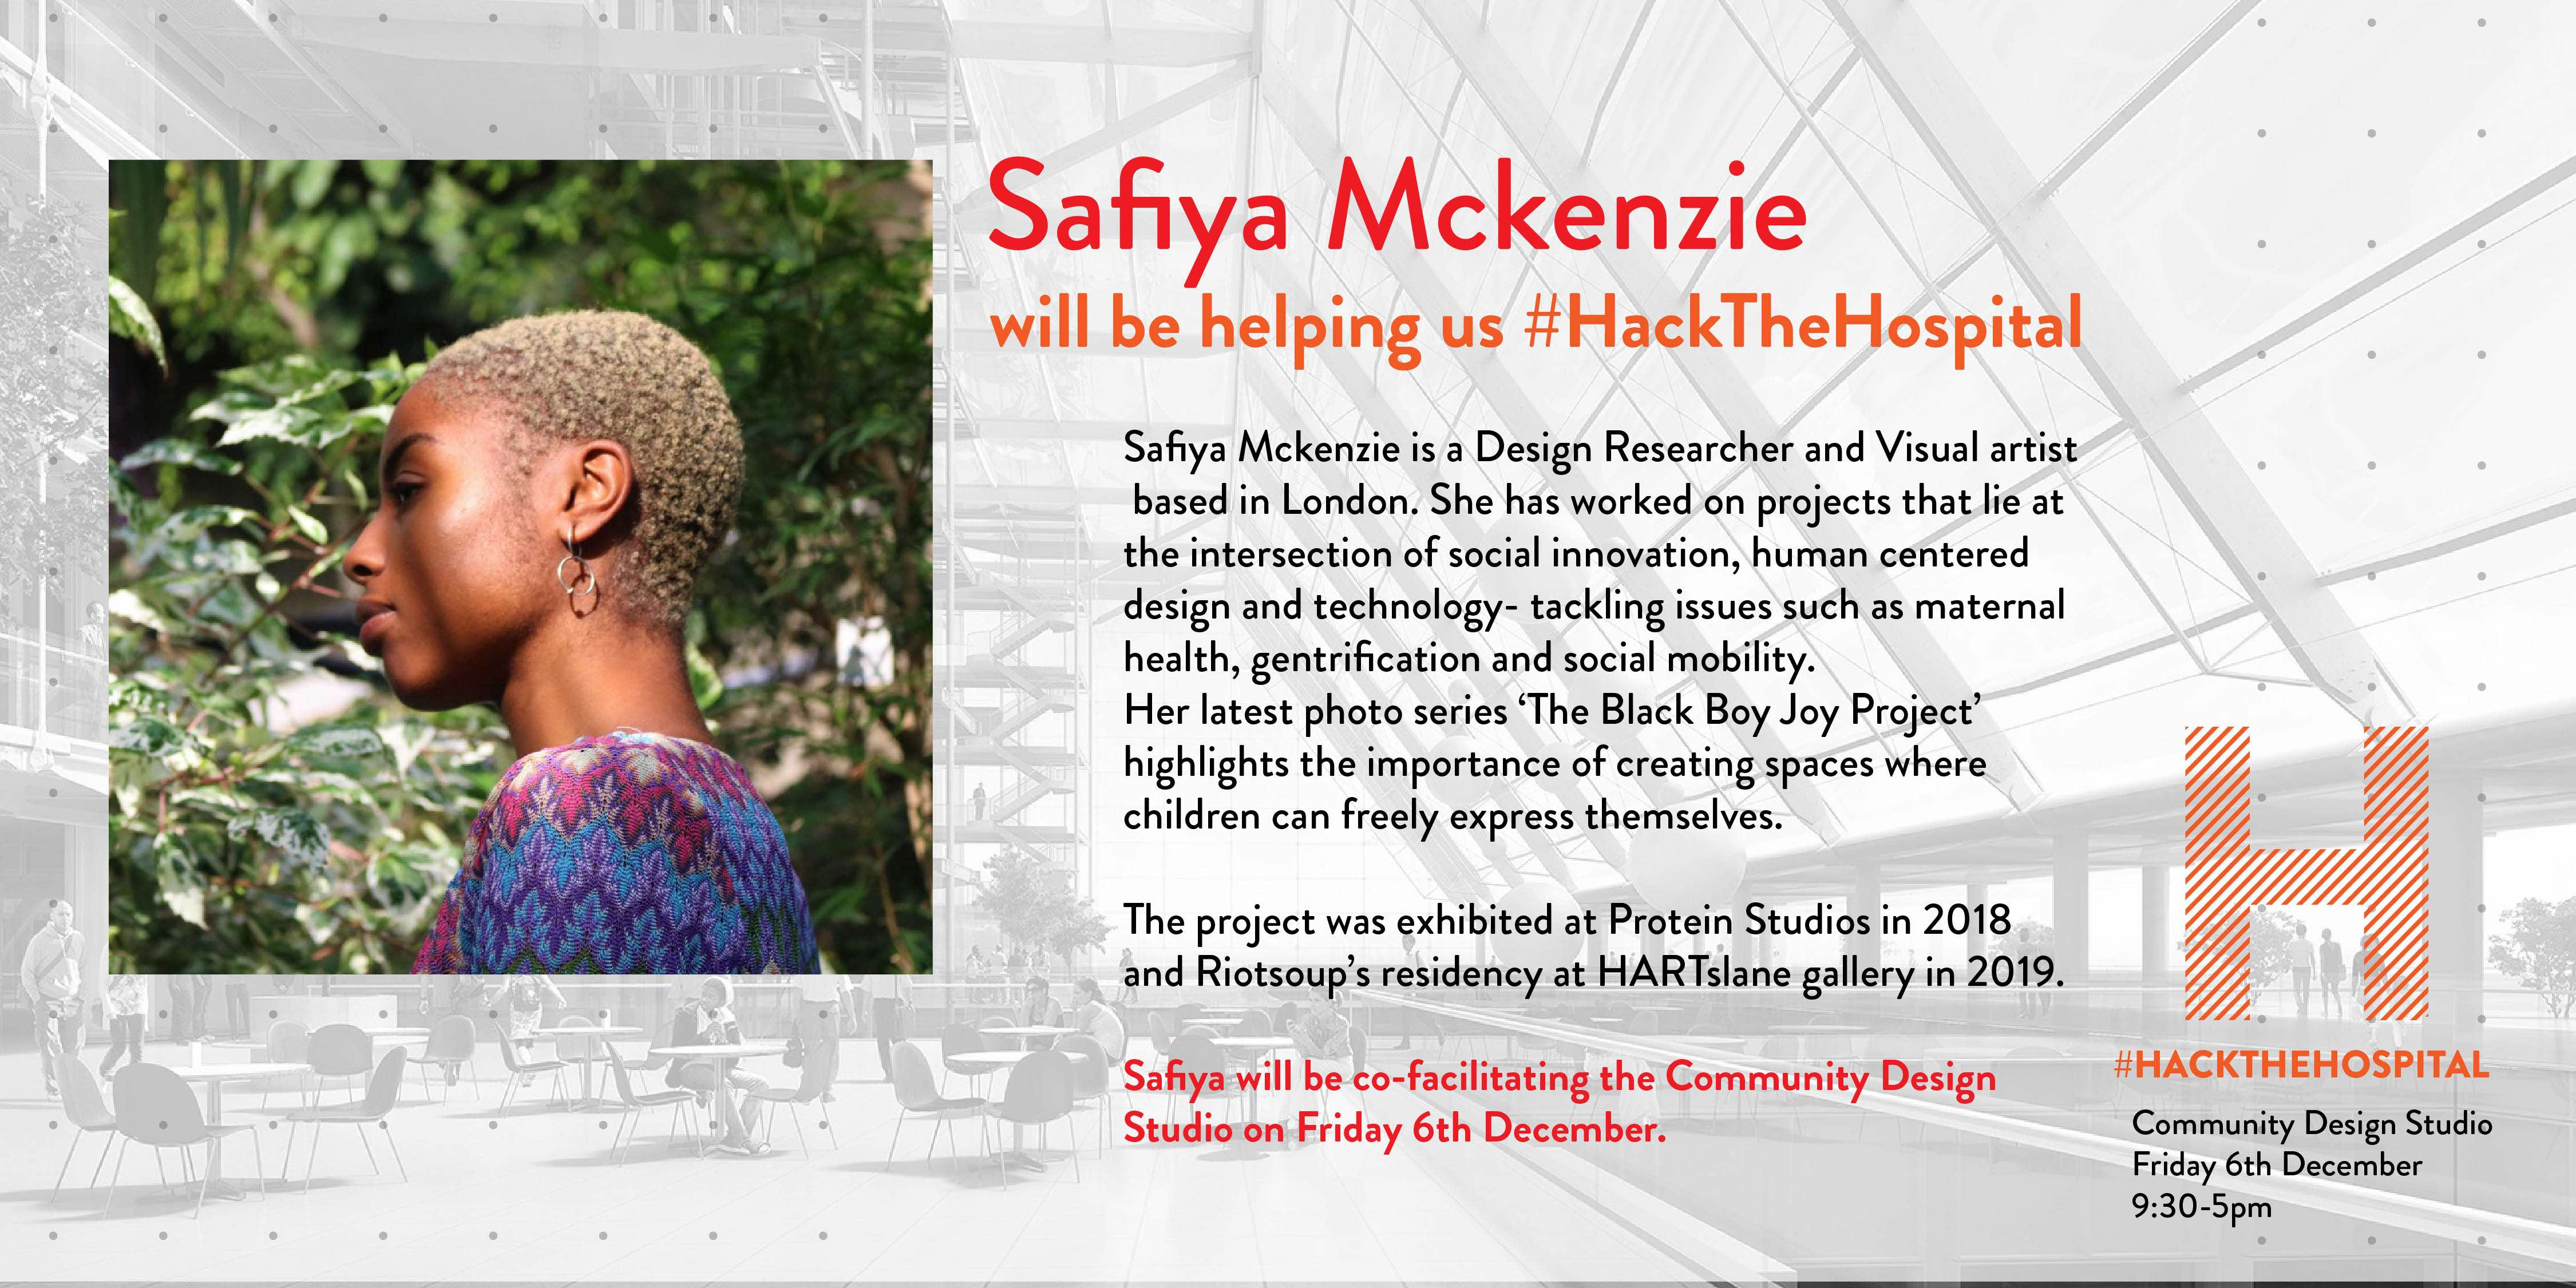 Safiya Mckenzie